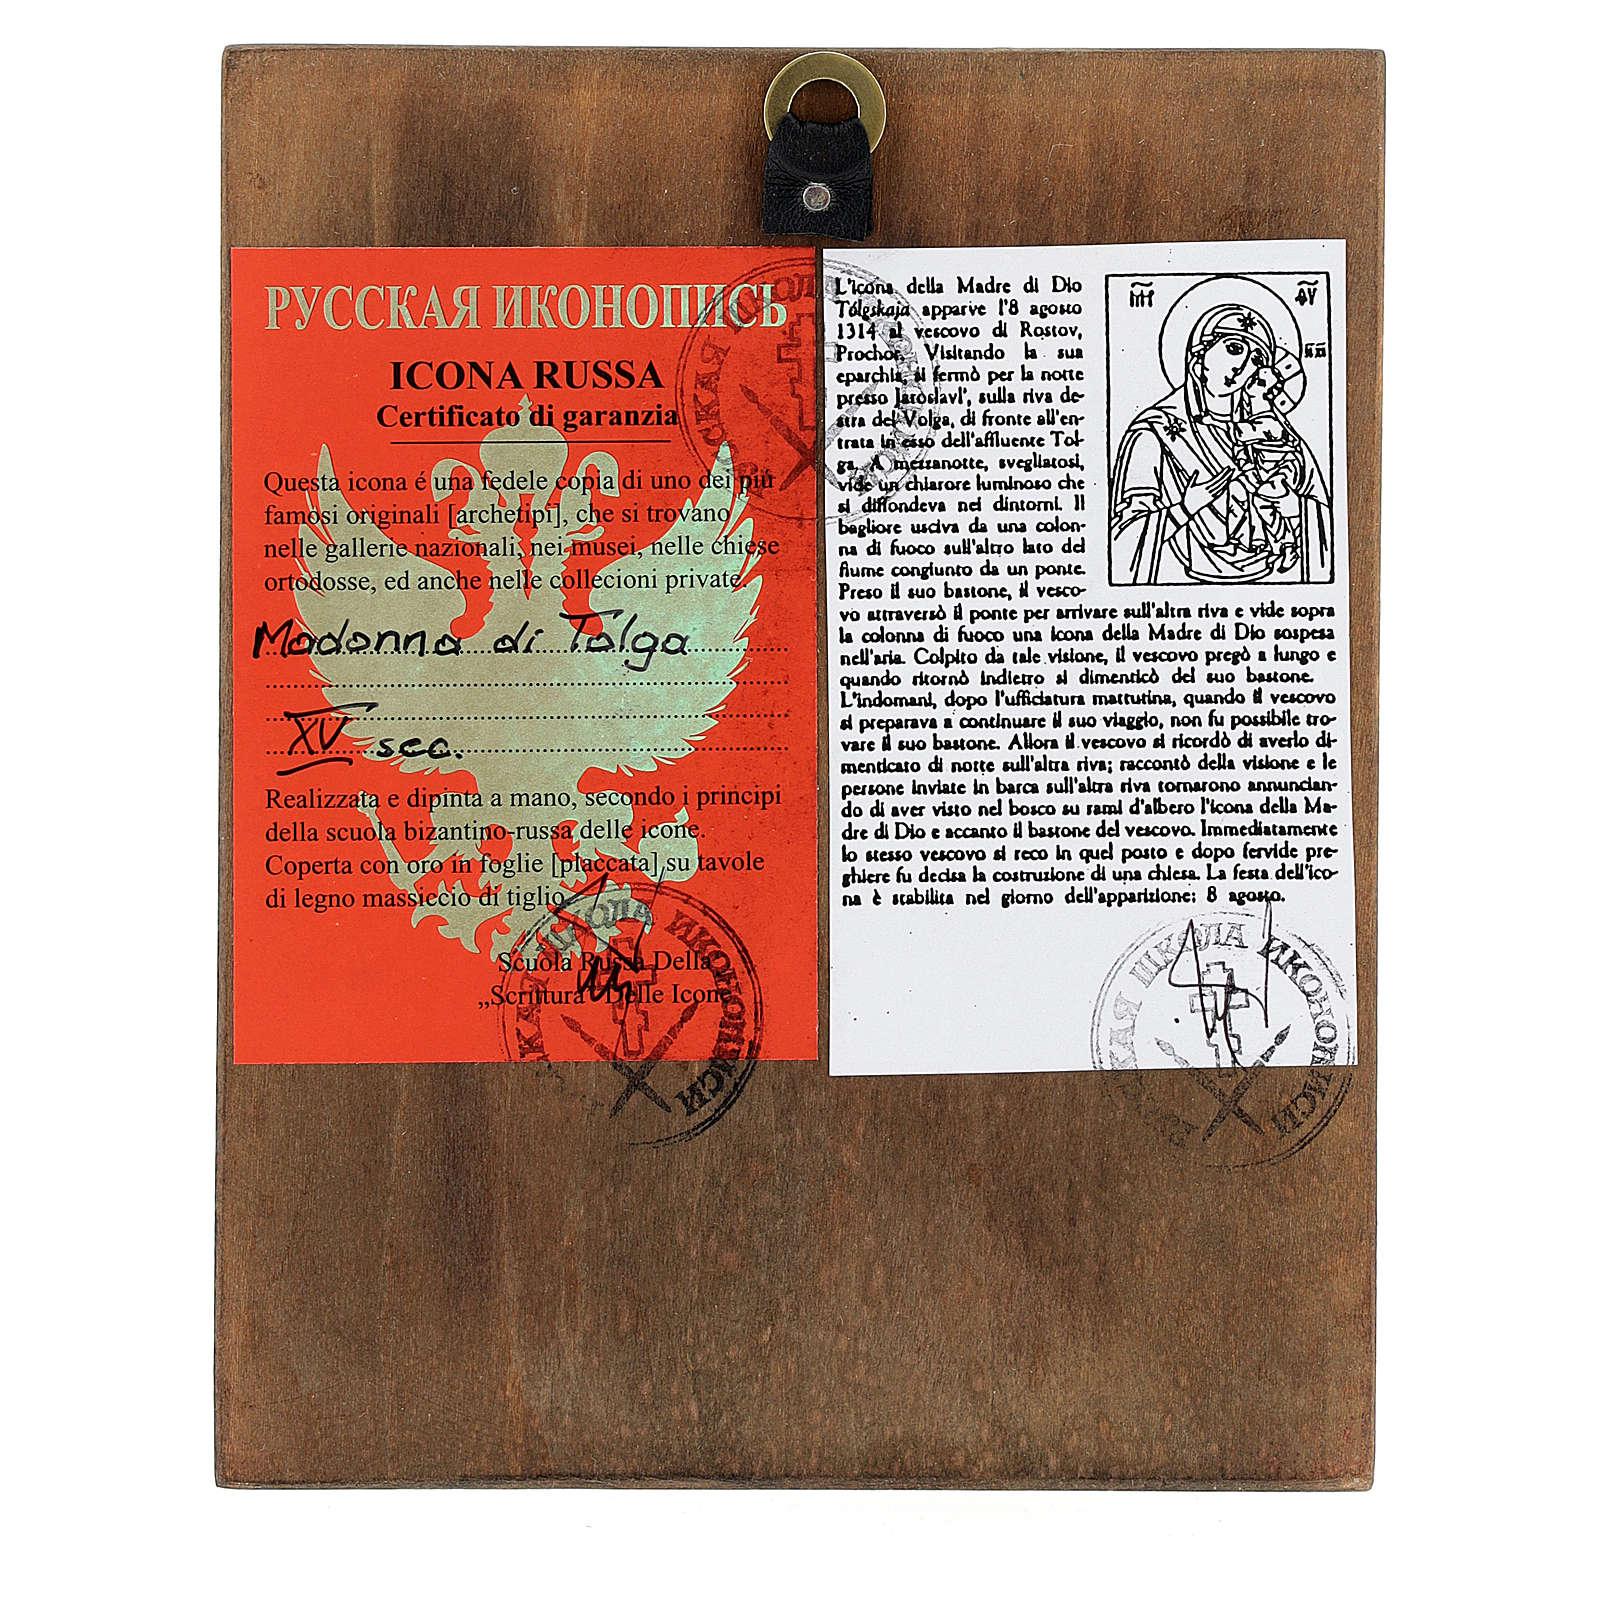 Icona russa Madonna di Tolga 14x10 cm Russia dipinta 4